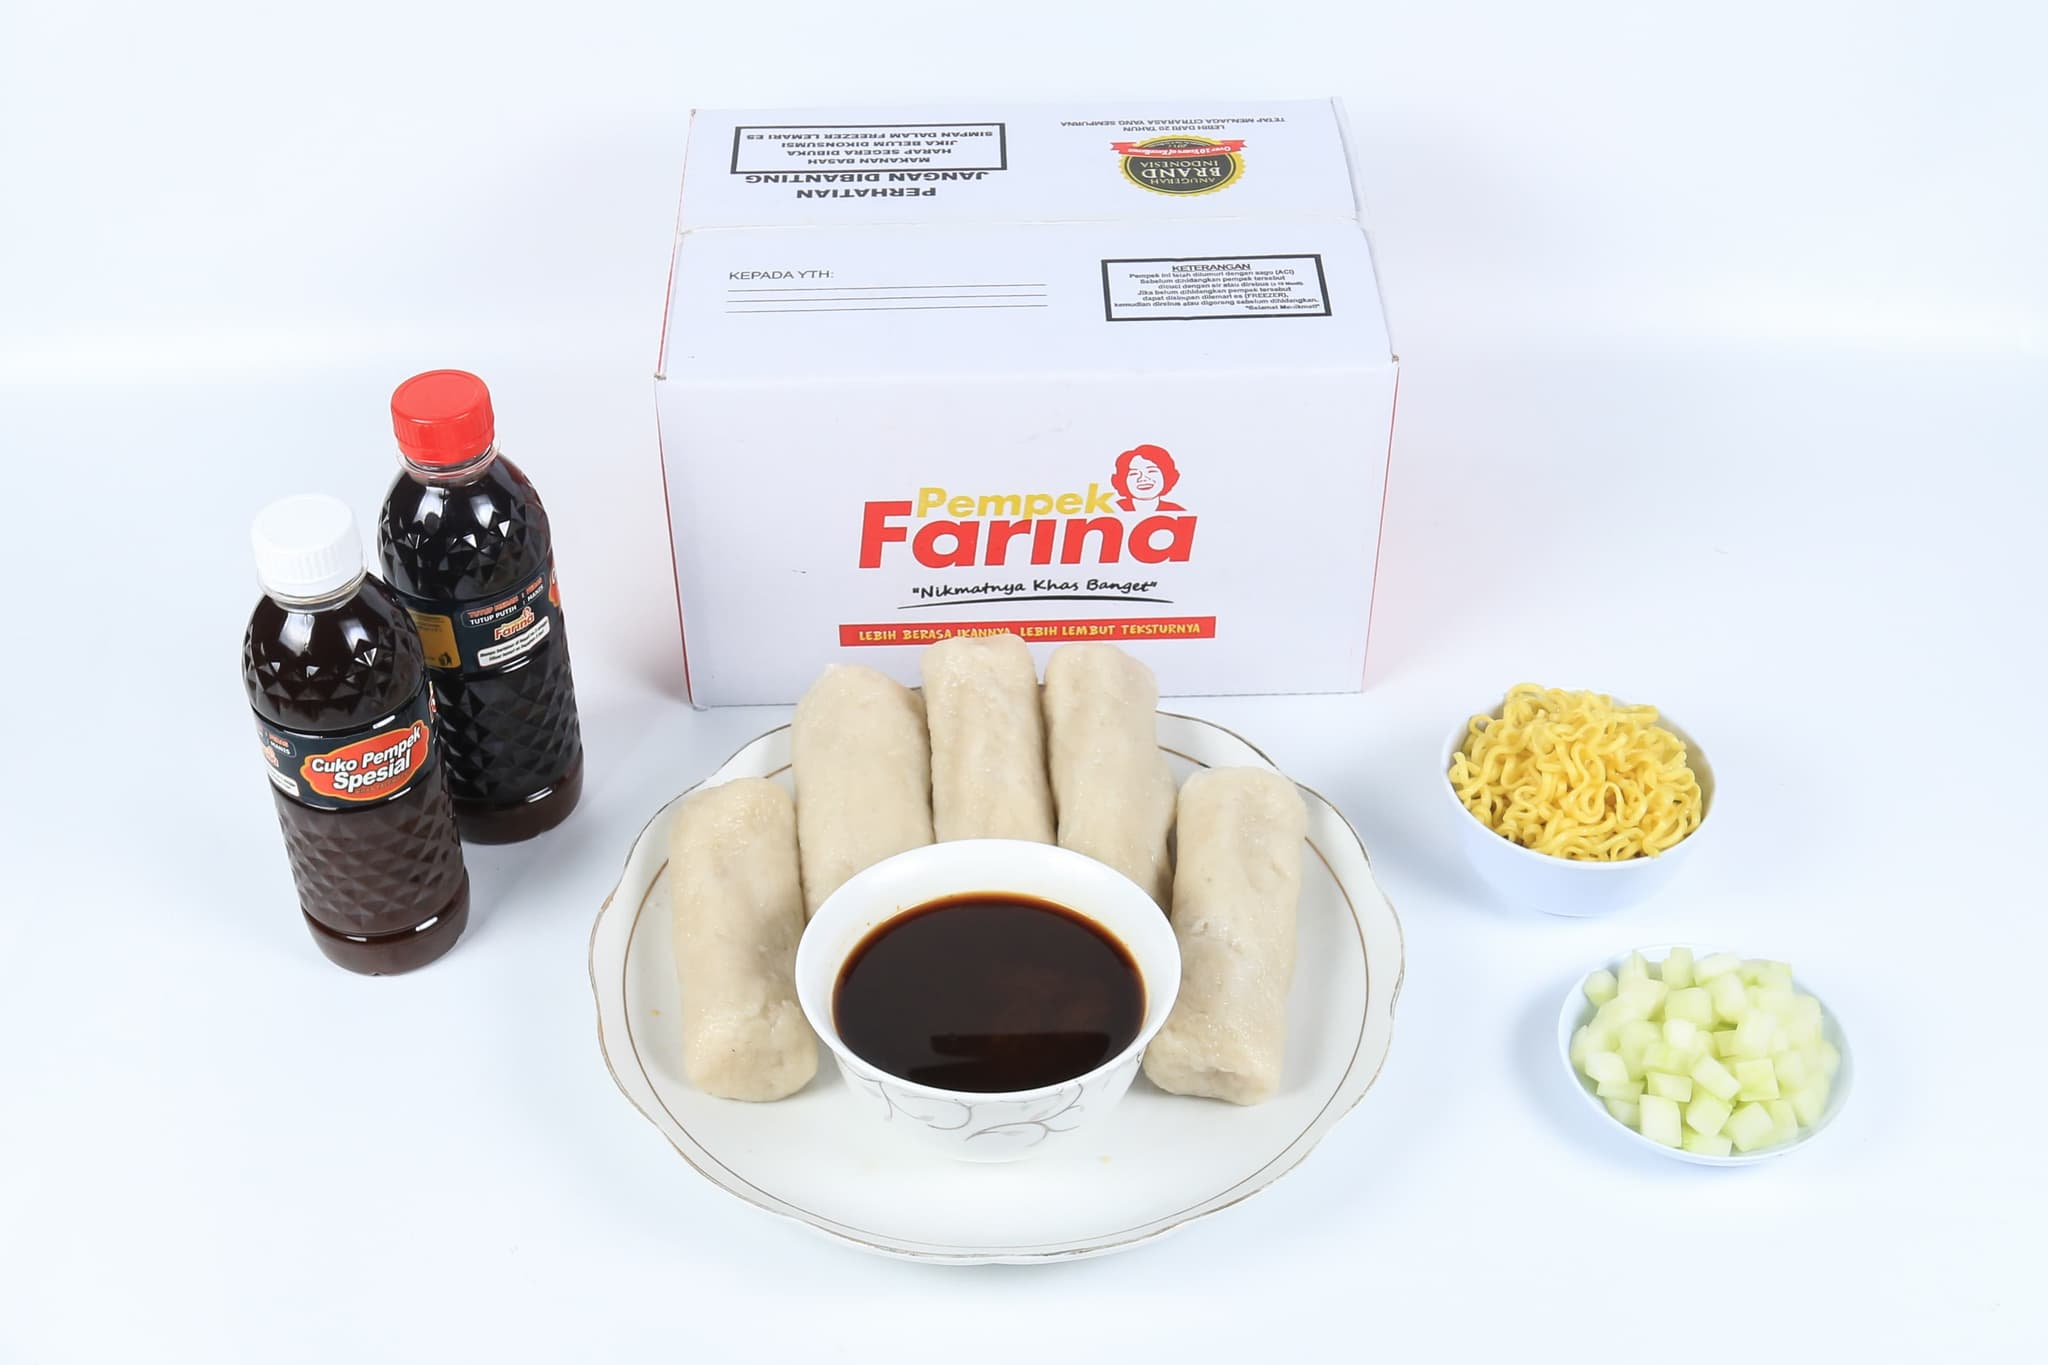 Pempek Farina Paket A4 - Blanja.com